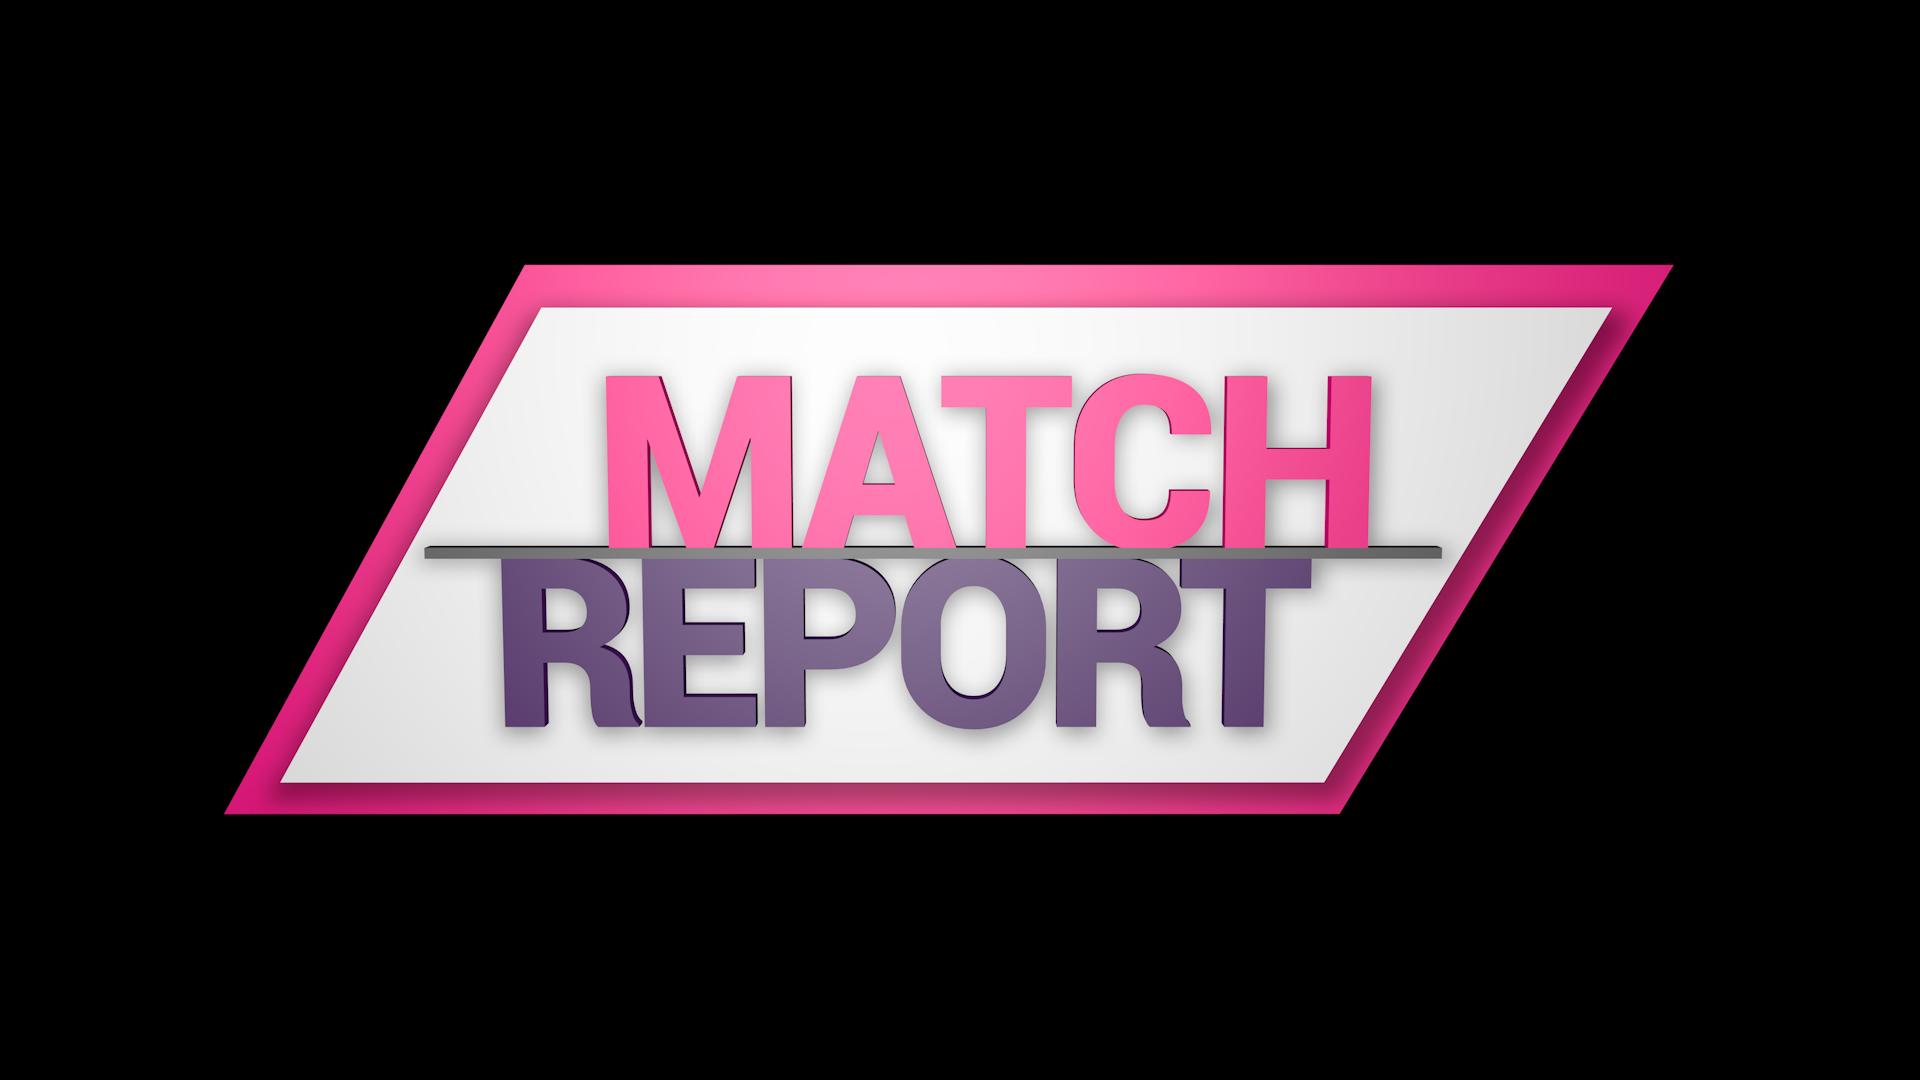 1st XI Match Report 23/07